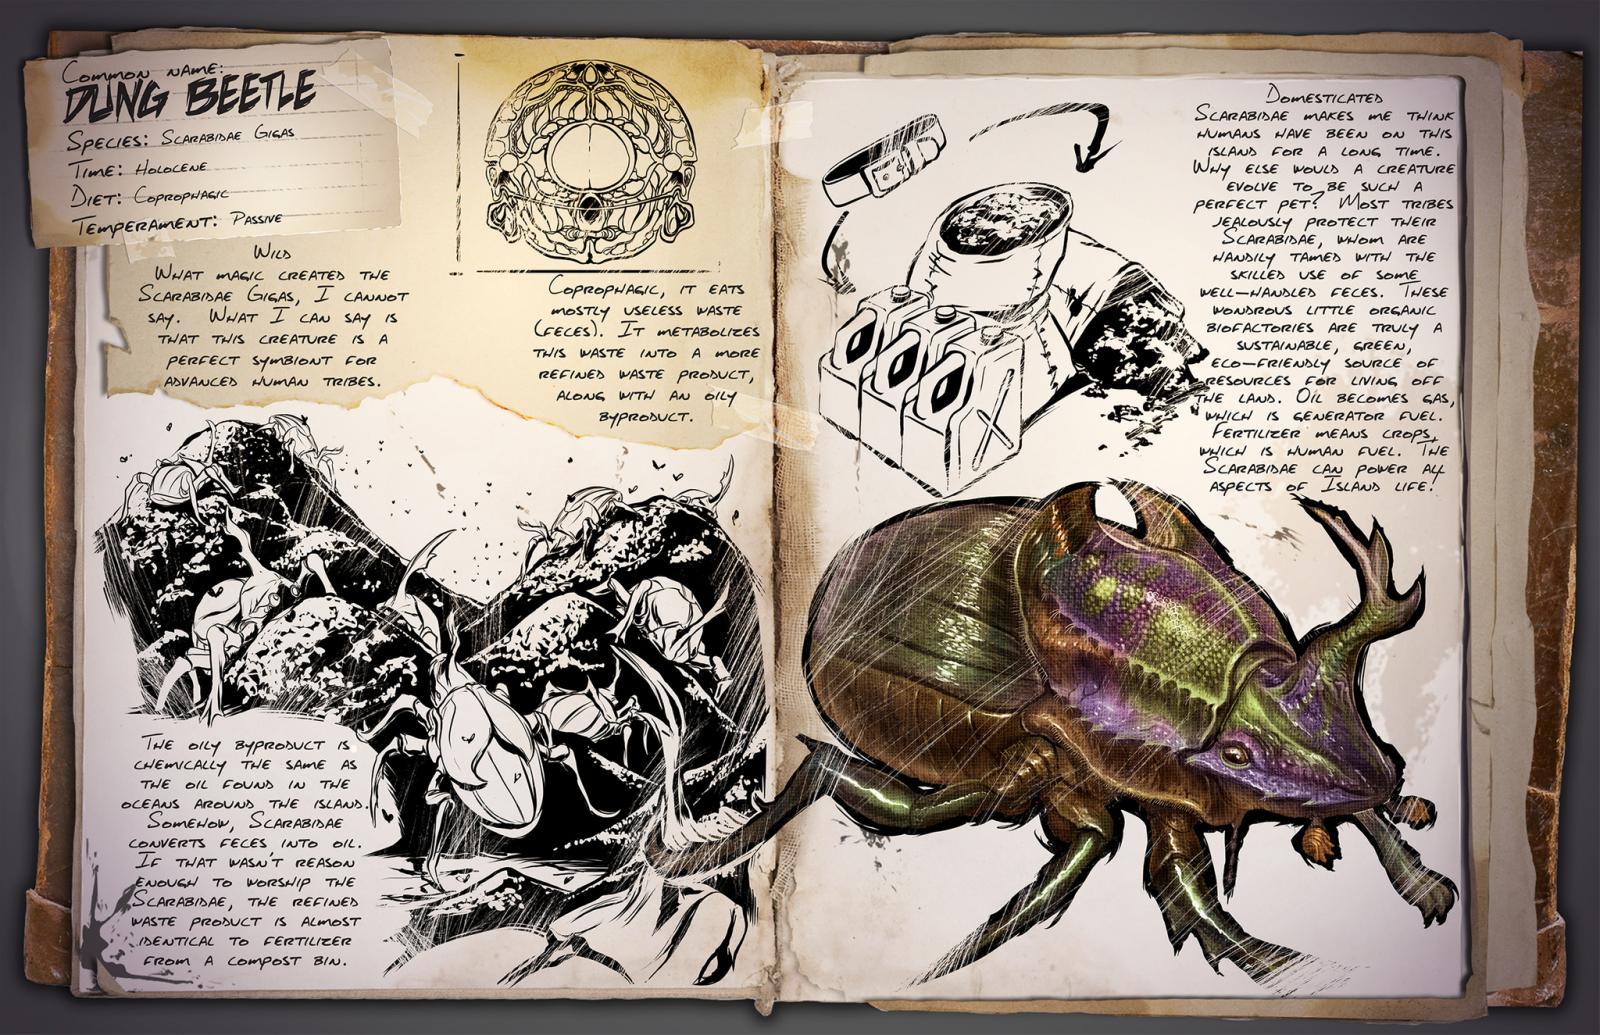 Dossier Dung Beetle.jpg